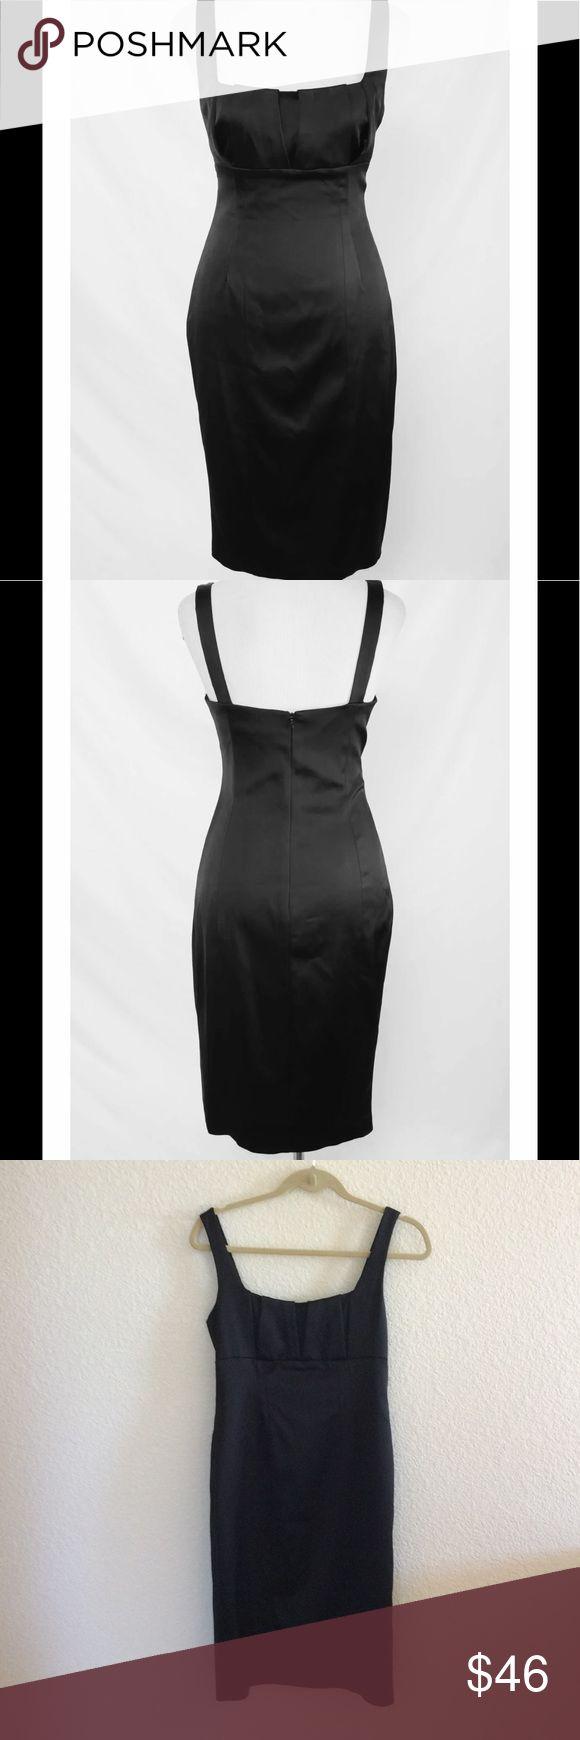 "David Meister Stretch satin lbd Beautiful like new stretch satin little black dress. Size 4.  38"" in length David Meister Dresses"